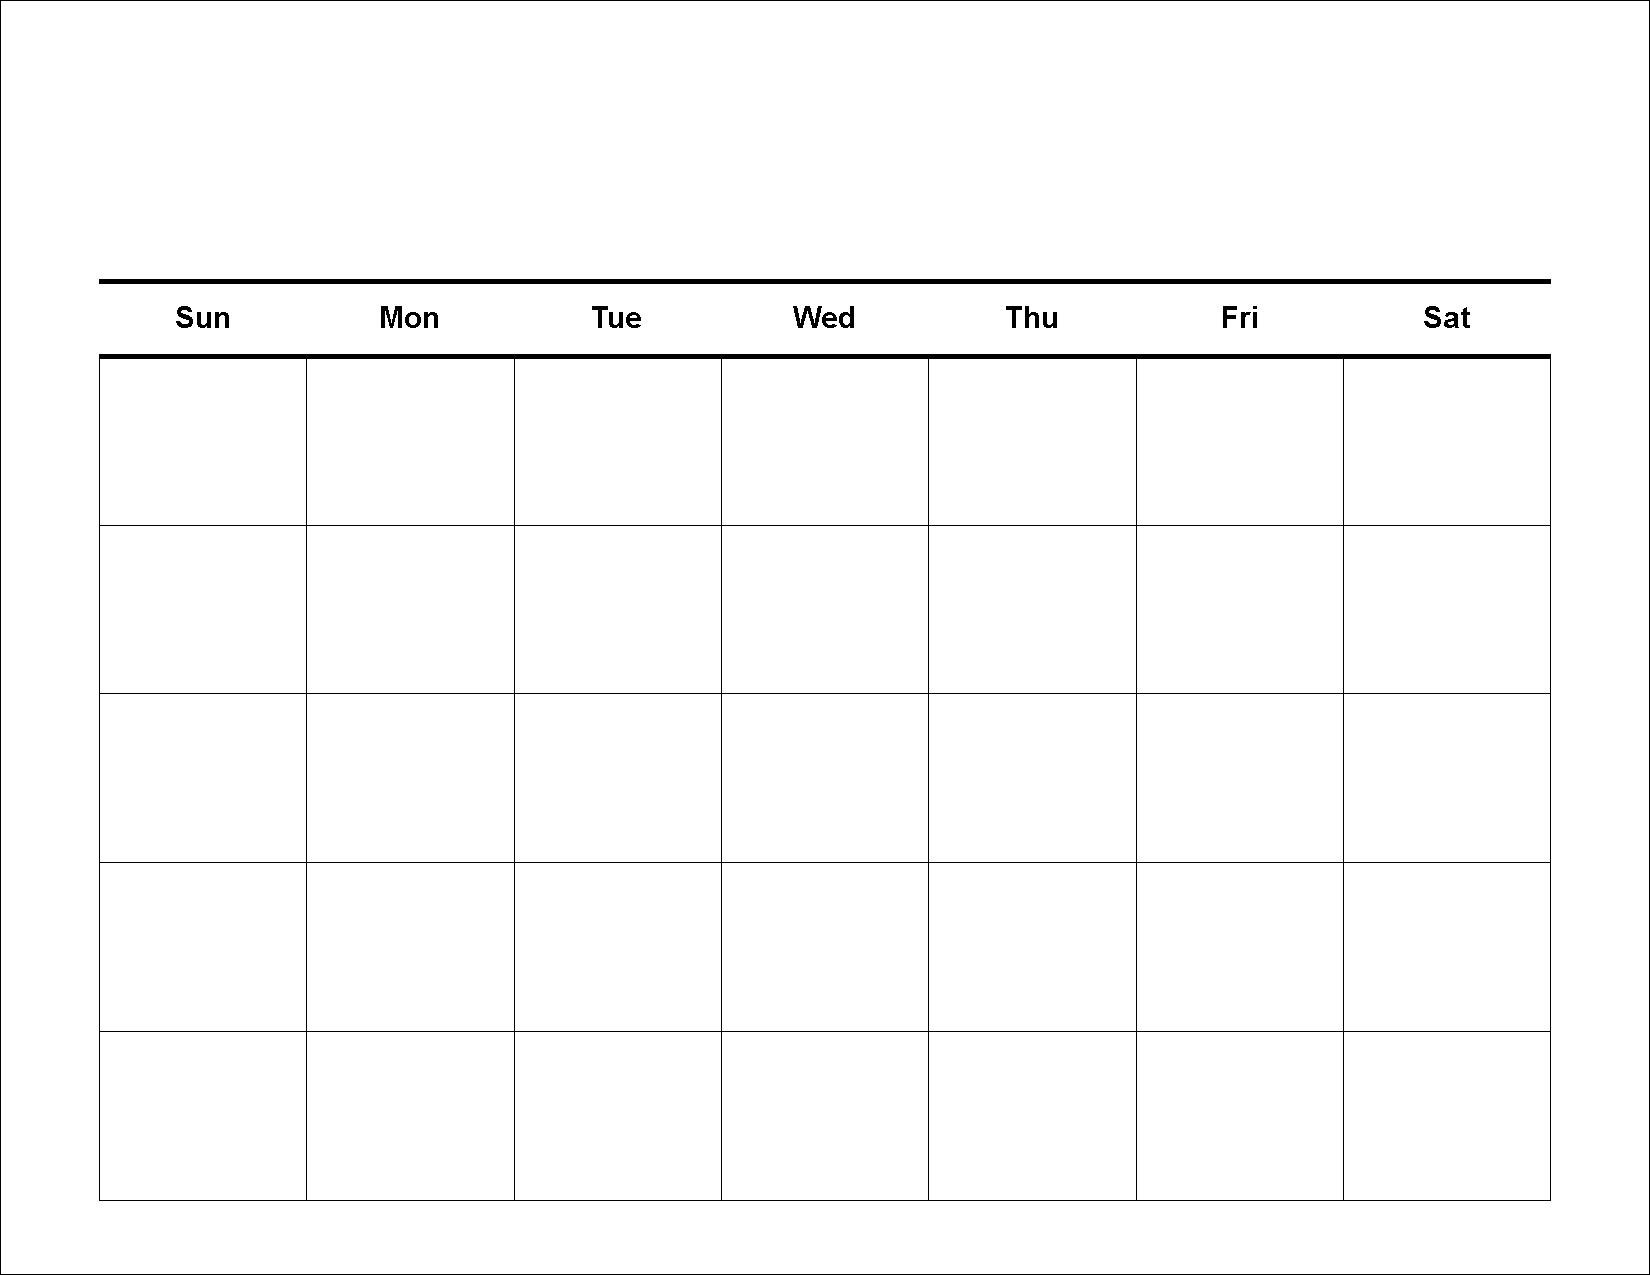 Print A Blank Calendar – 2017 Printable Calendar for 5 Day Week Blank Calendar Printable